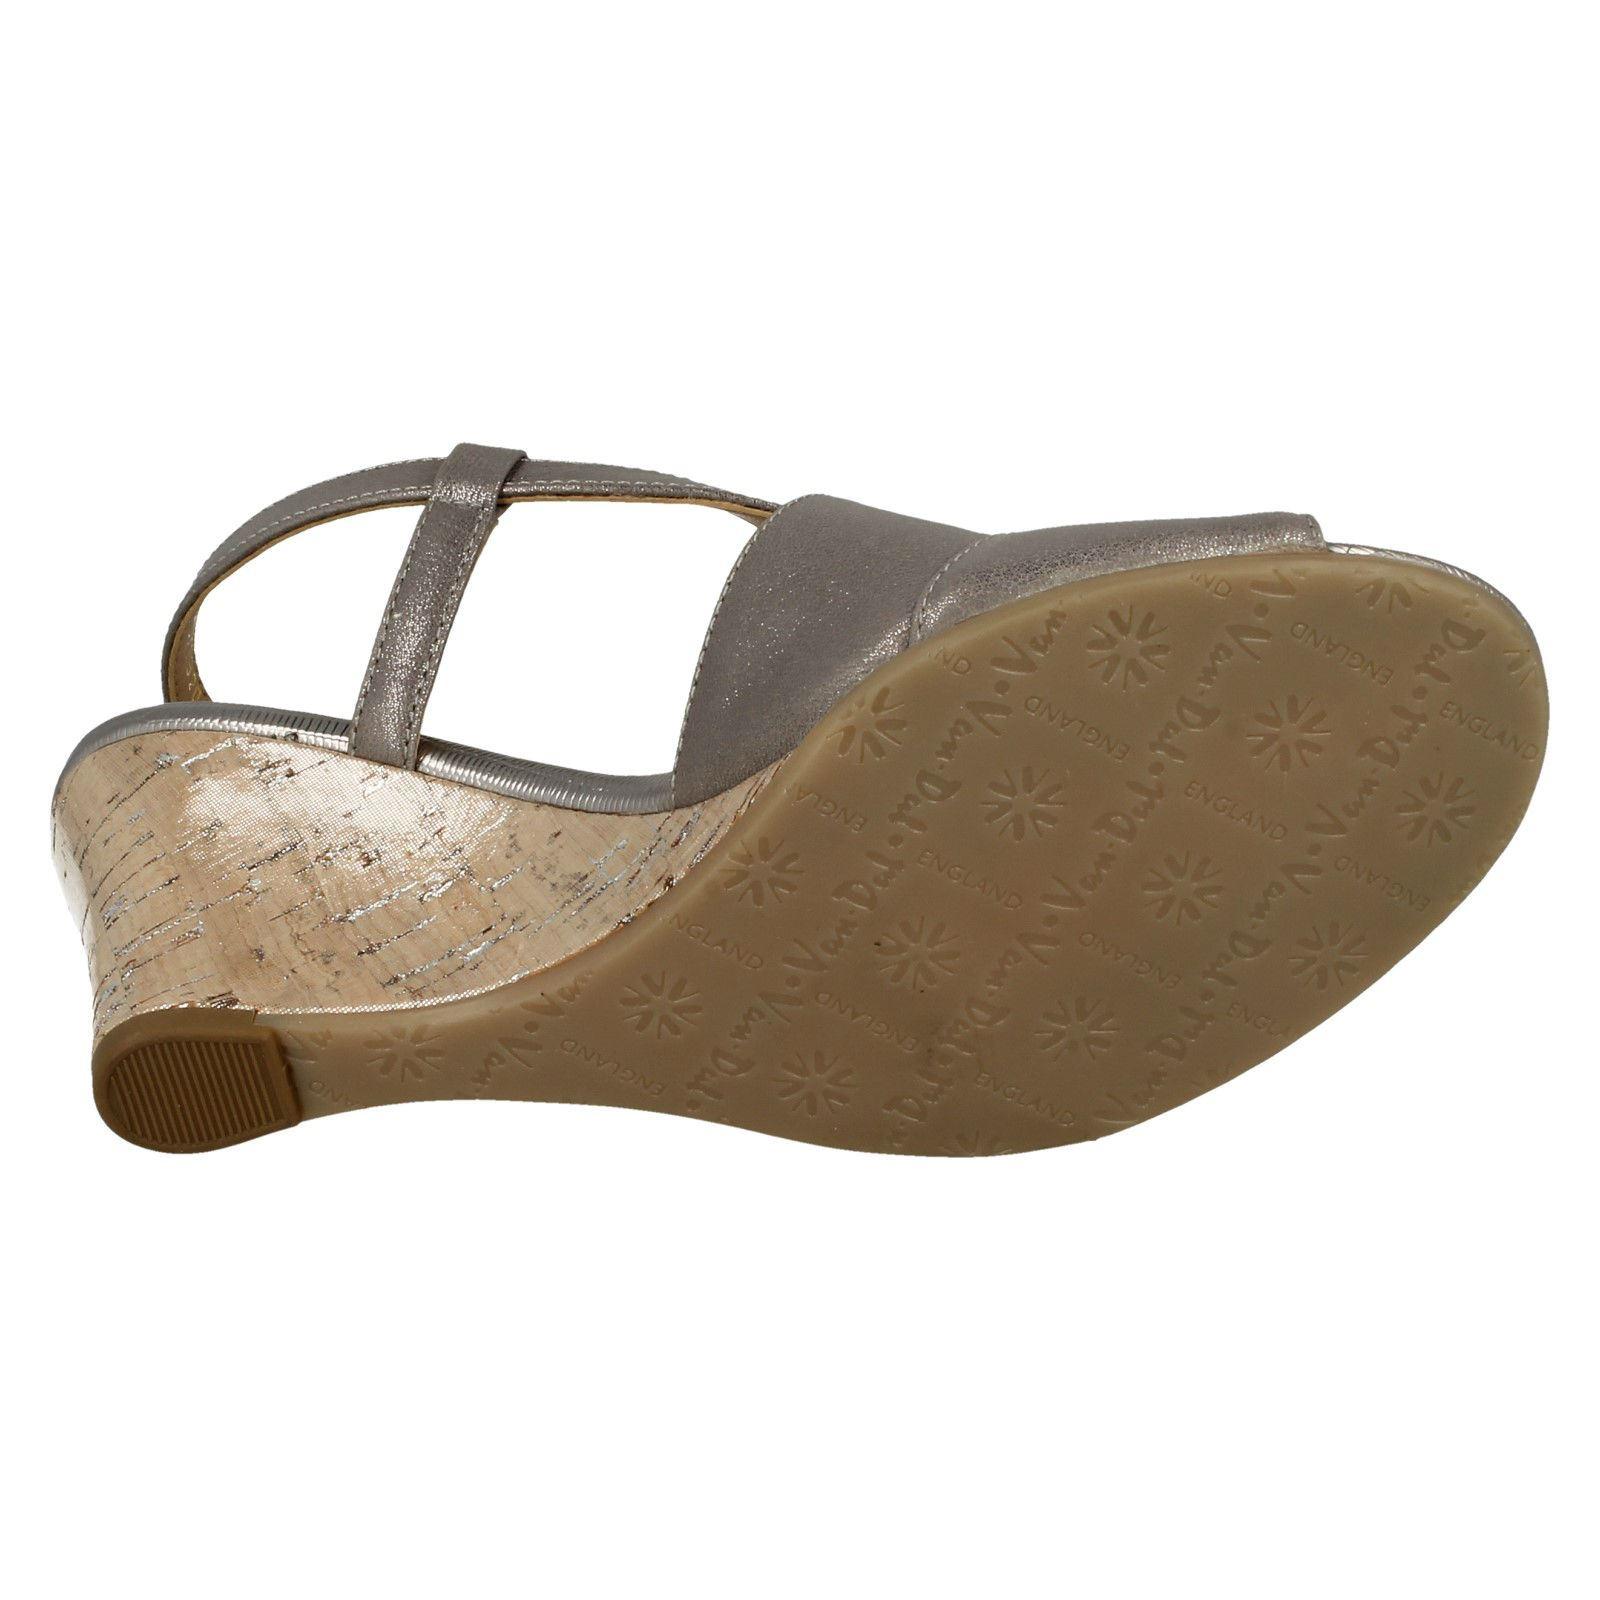 Ladies-Van-Dal-Cross-Strap-Wedged-Sandal-Allora thumbnail 25